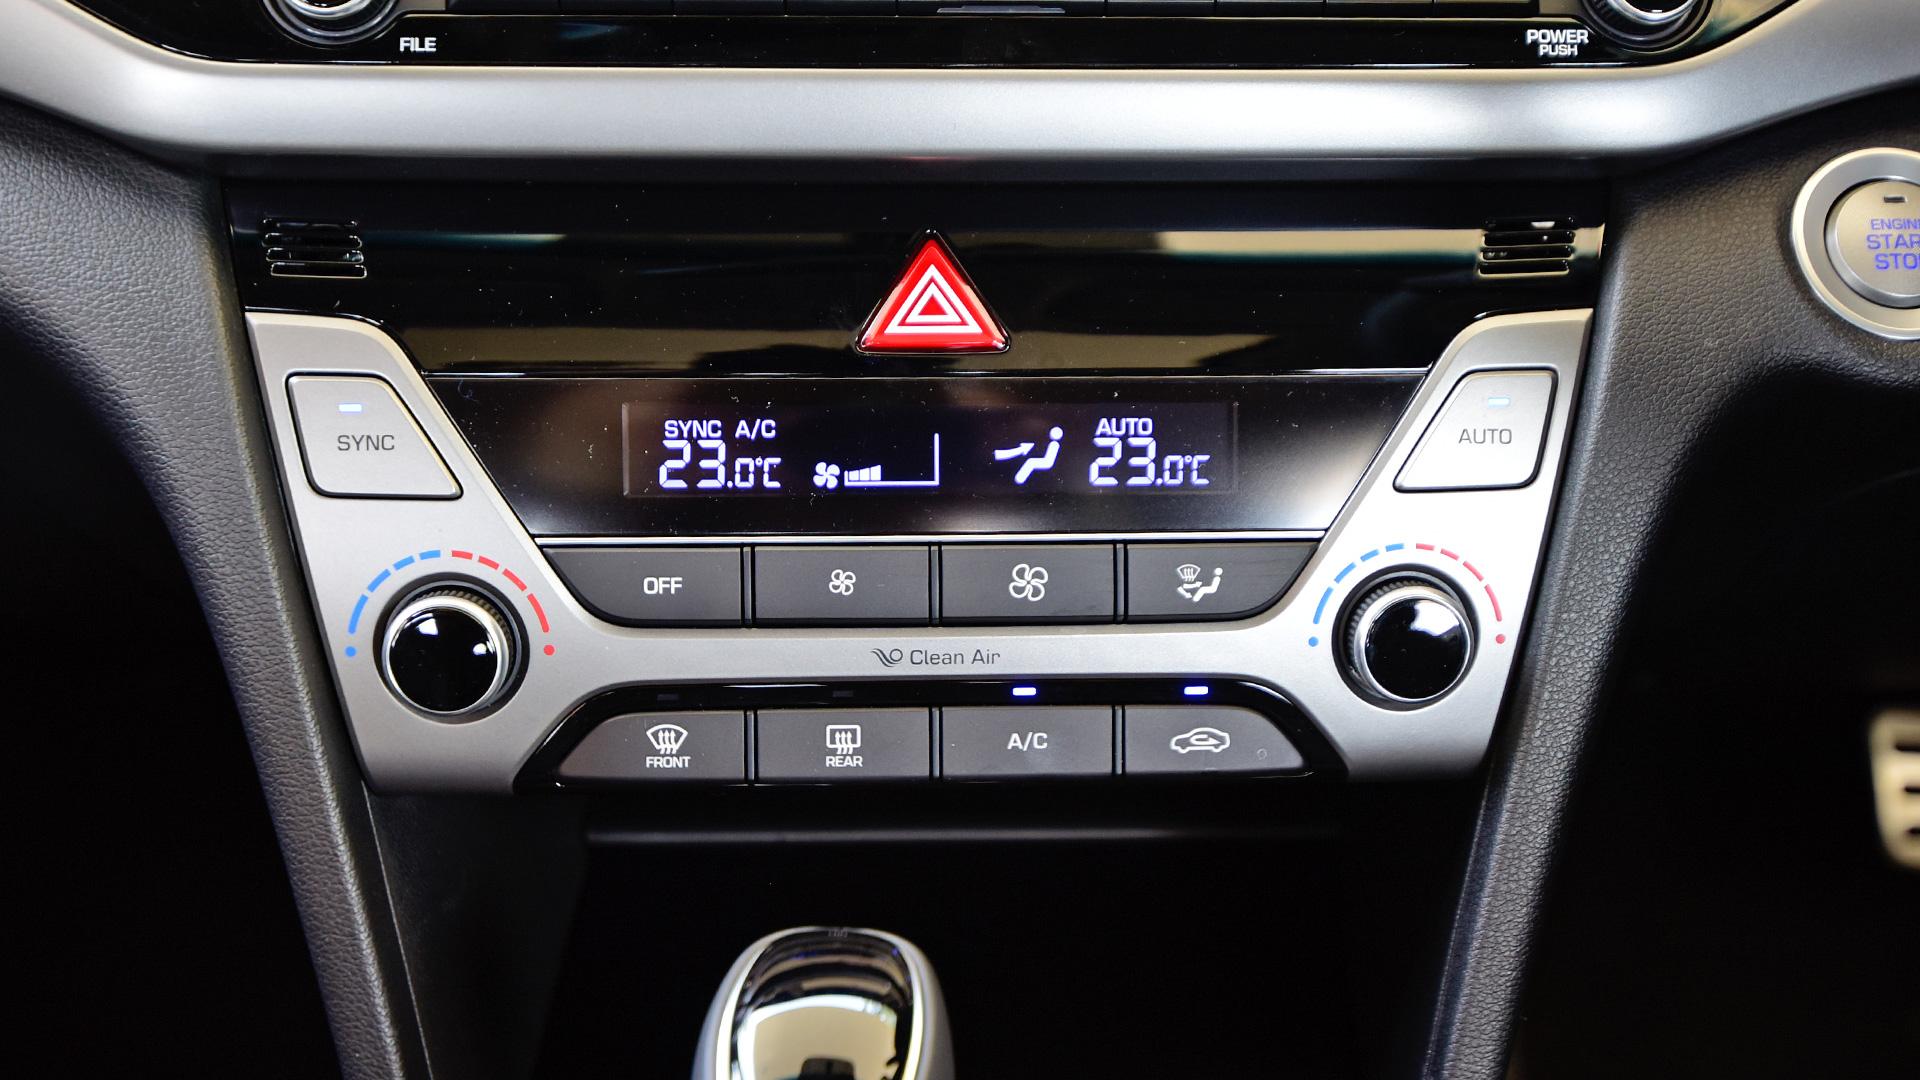 hyundai-elantra-2016-2.0 Petrol SX (O)AT Interior